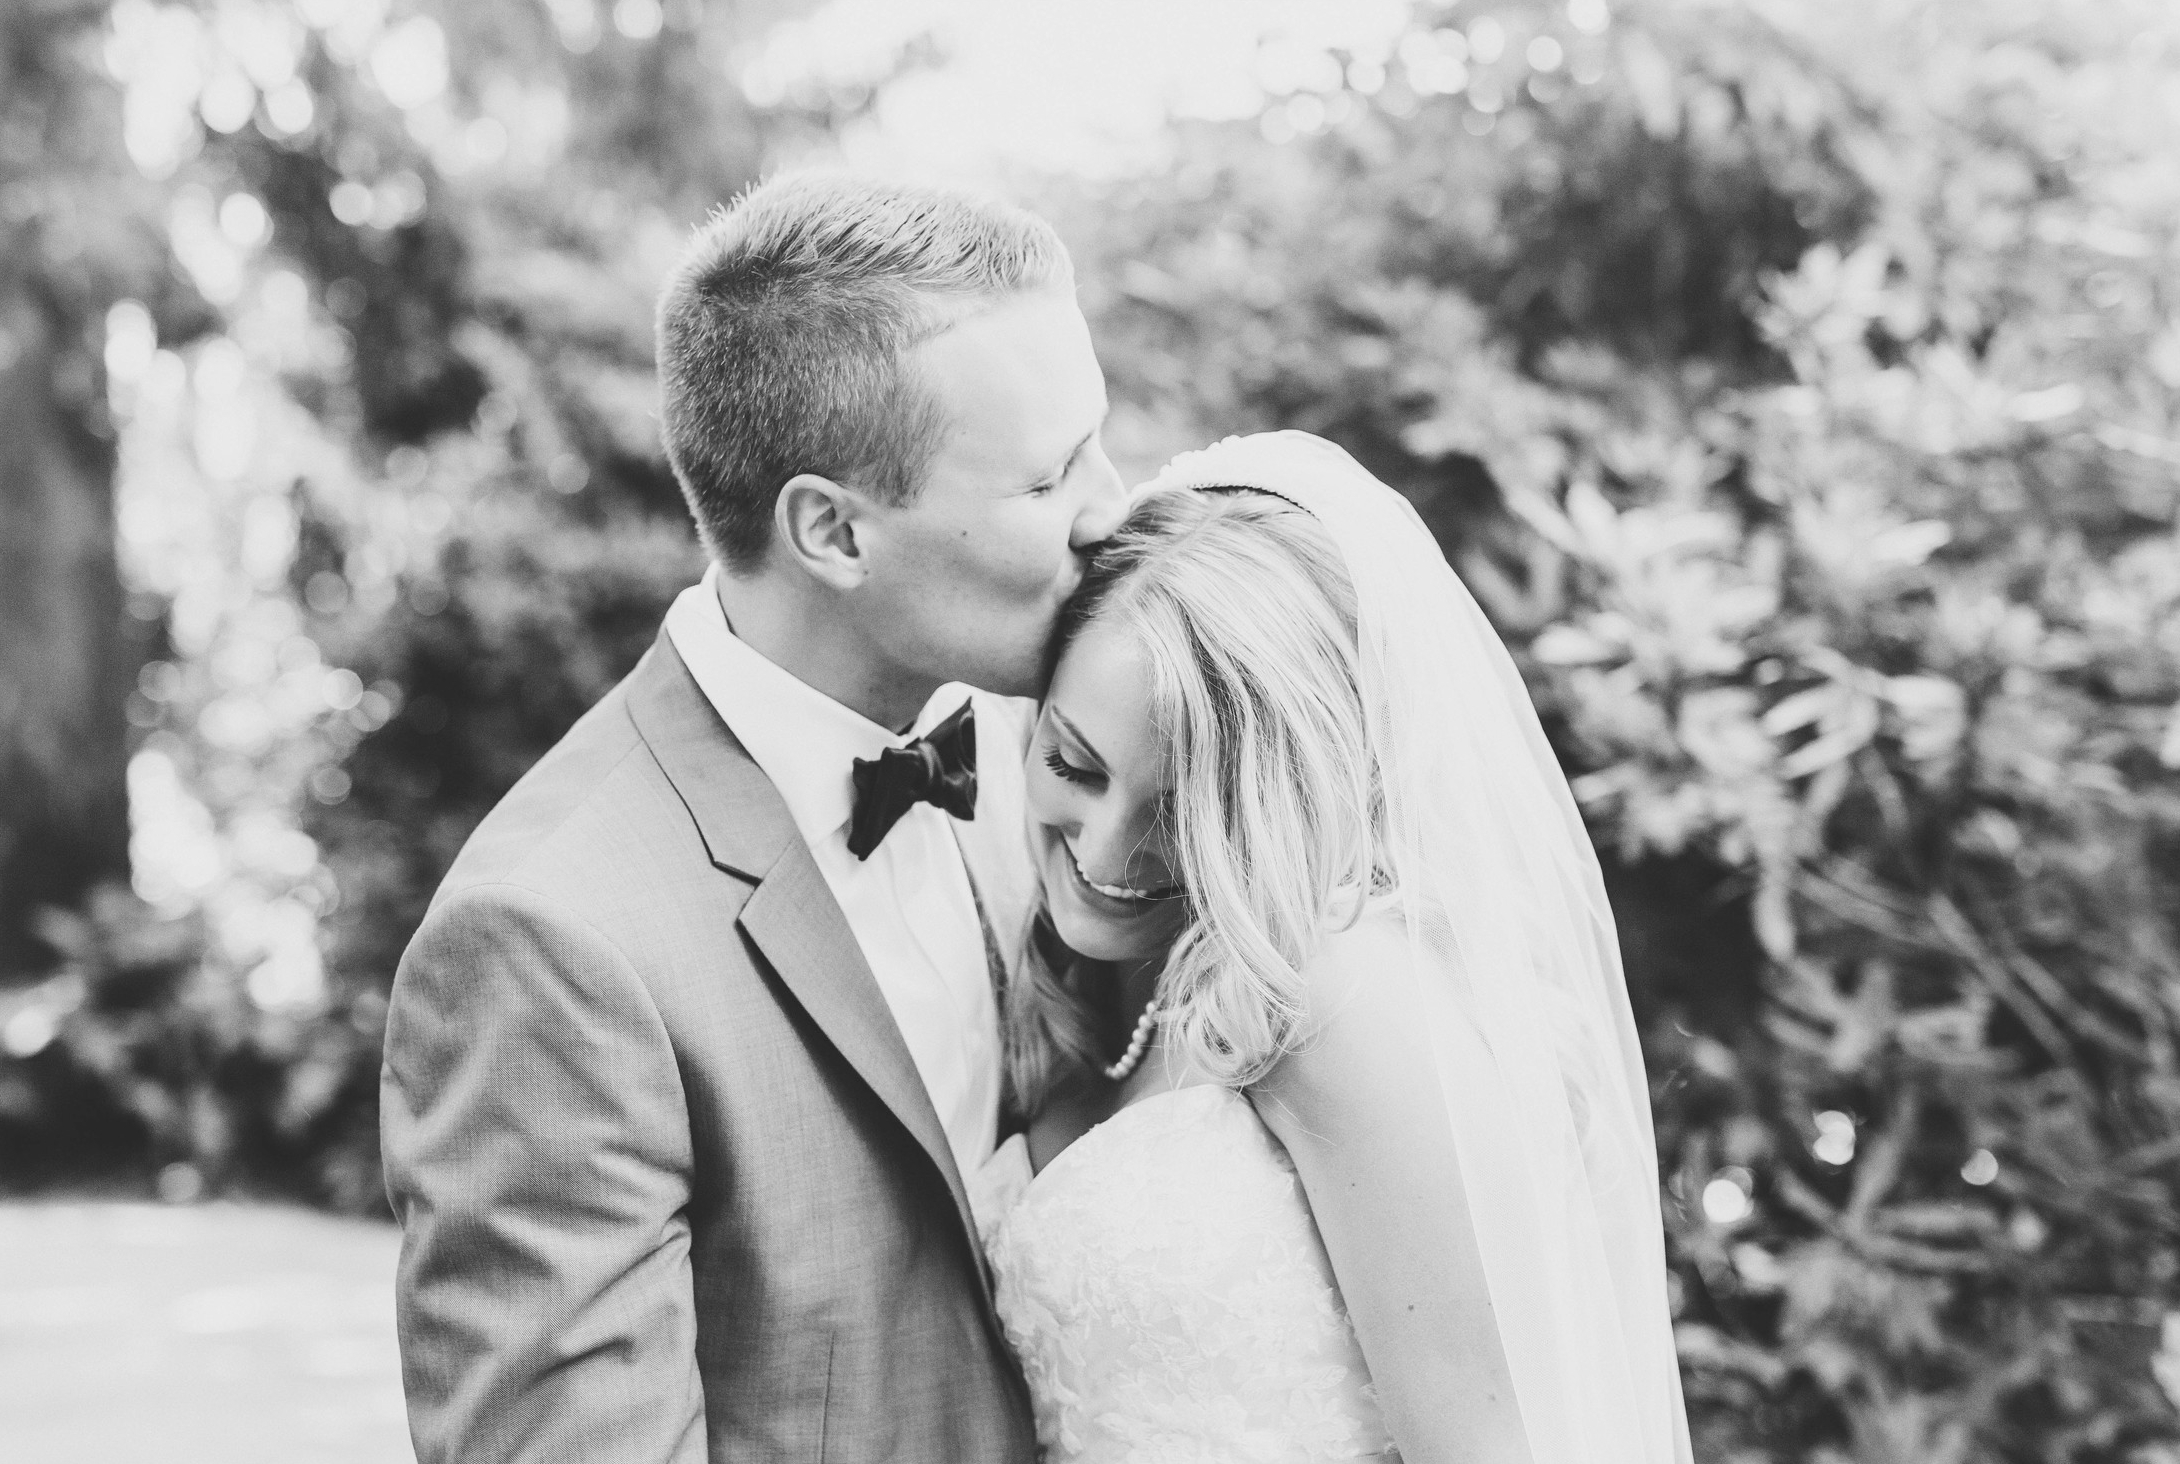 IMG_2354 VANCOUVER WEDDING PHOTOGRAPHER JENNIFER PICARD PHOTOGRAPHY.jpg